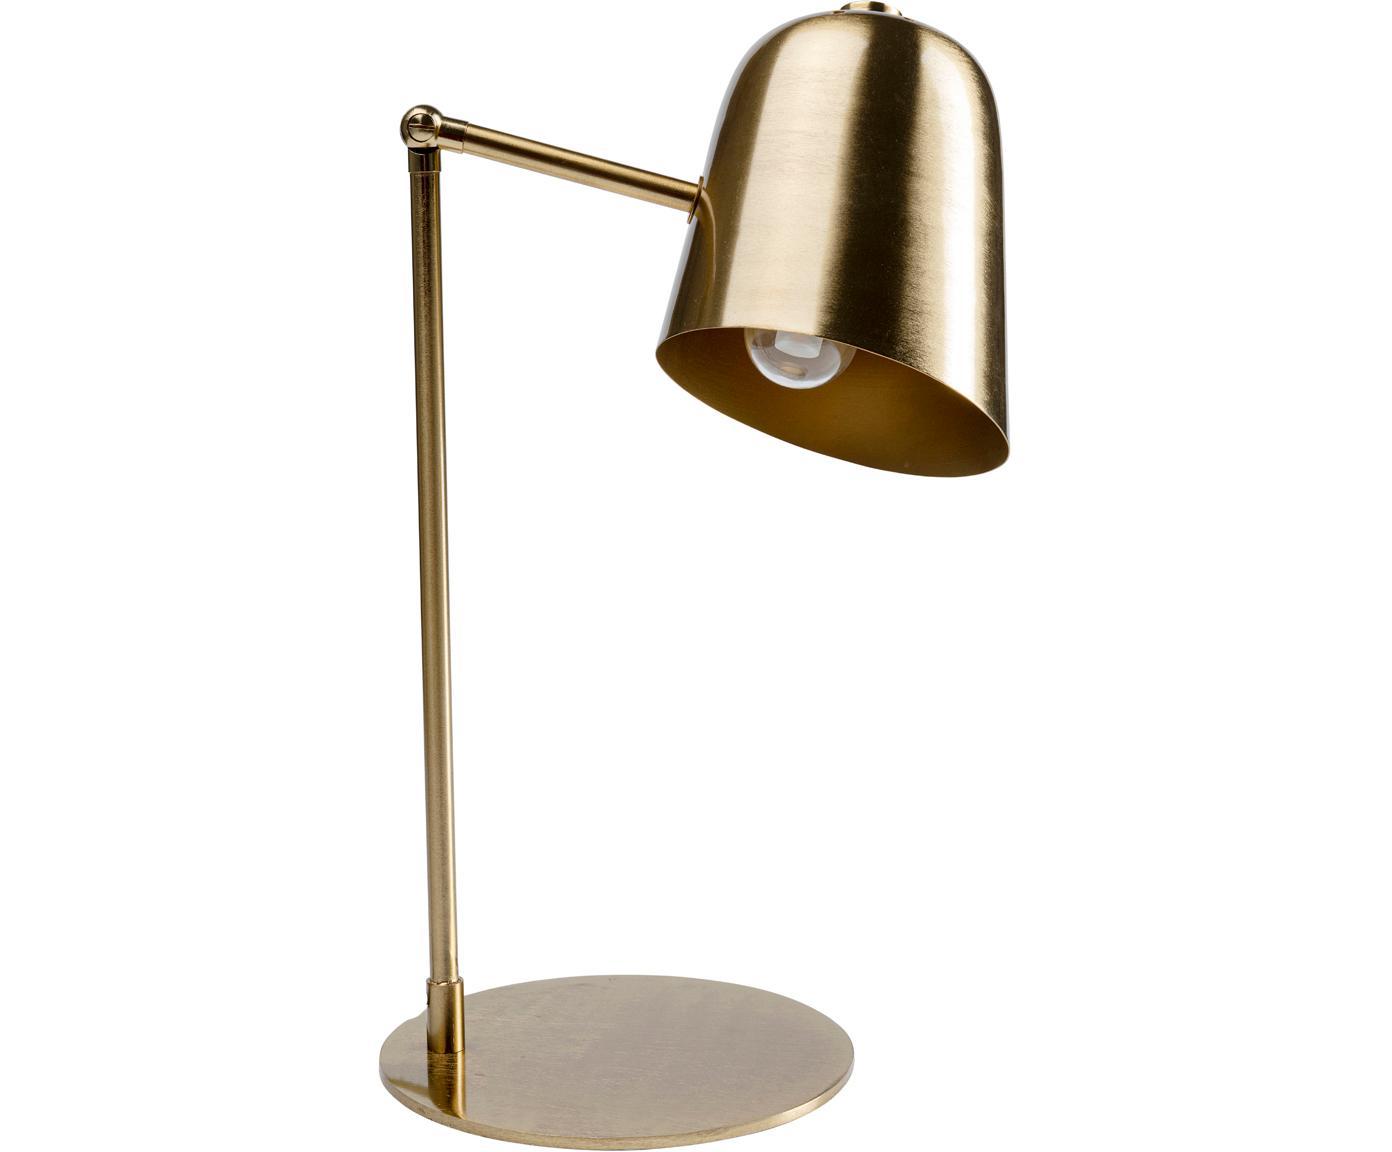 Retro bureaulamp Clive, Lampenkap: vermessingd staal, Lampvoet: vermessingd staal, Messingkleurig, 27 x 56 cm